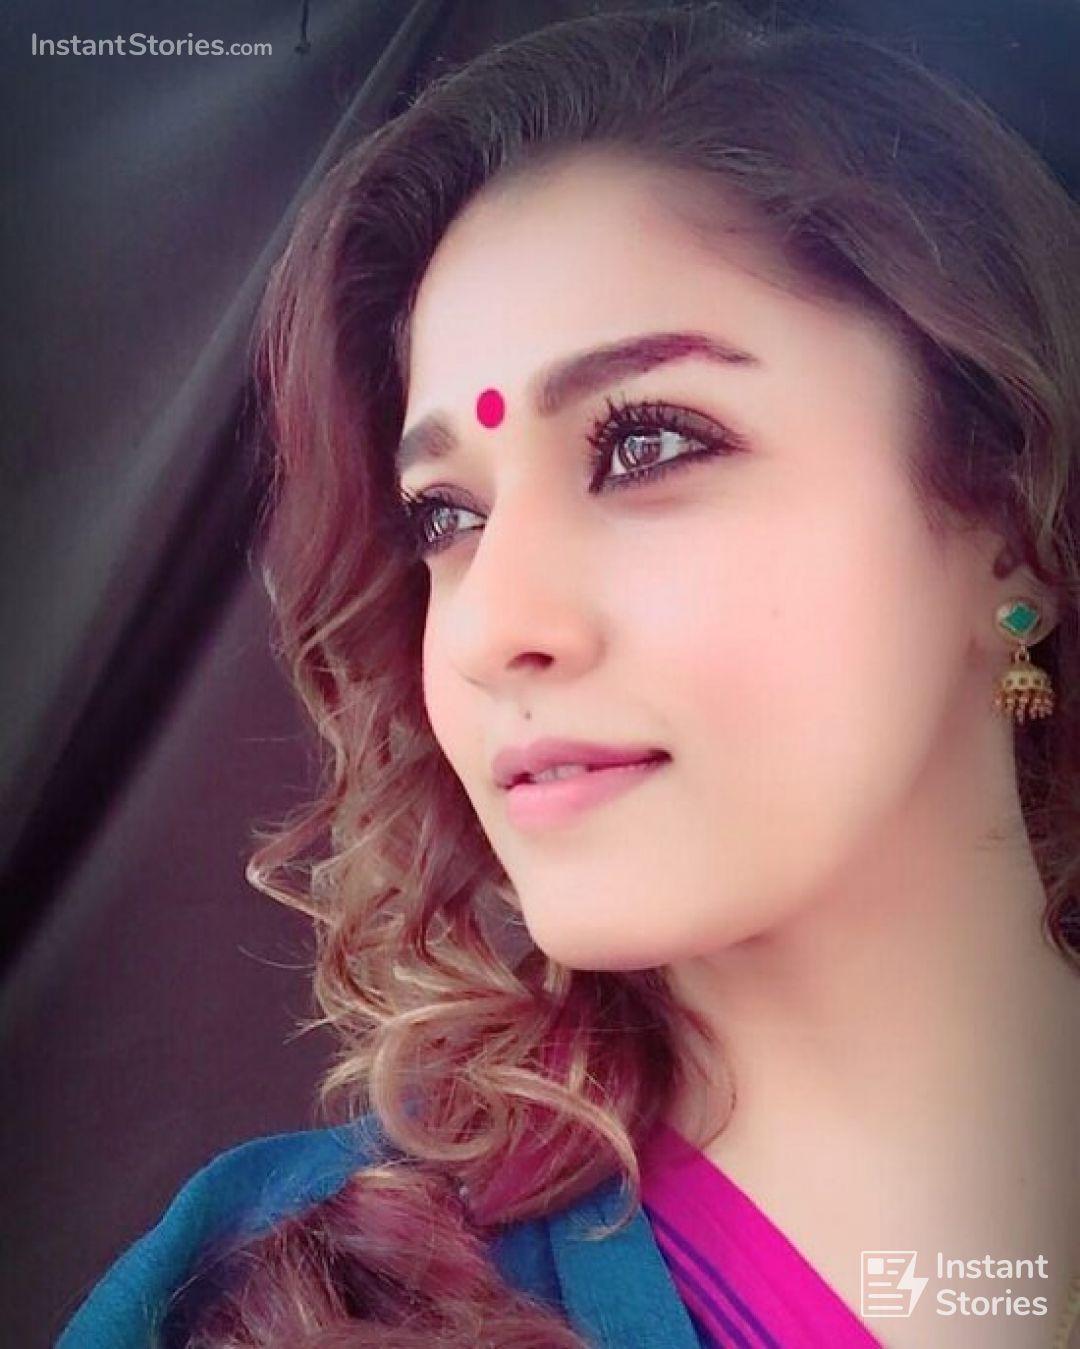 Nayanthara Latest Hot Hd Images Wallpapers Download 1080p 858 Nayanthara Pretty Eye Makeup Pretty Eyes Eye Makeup